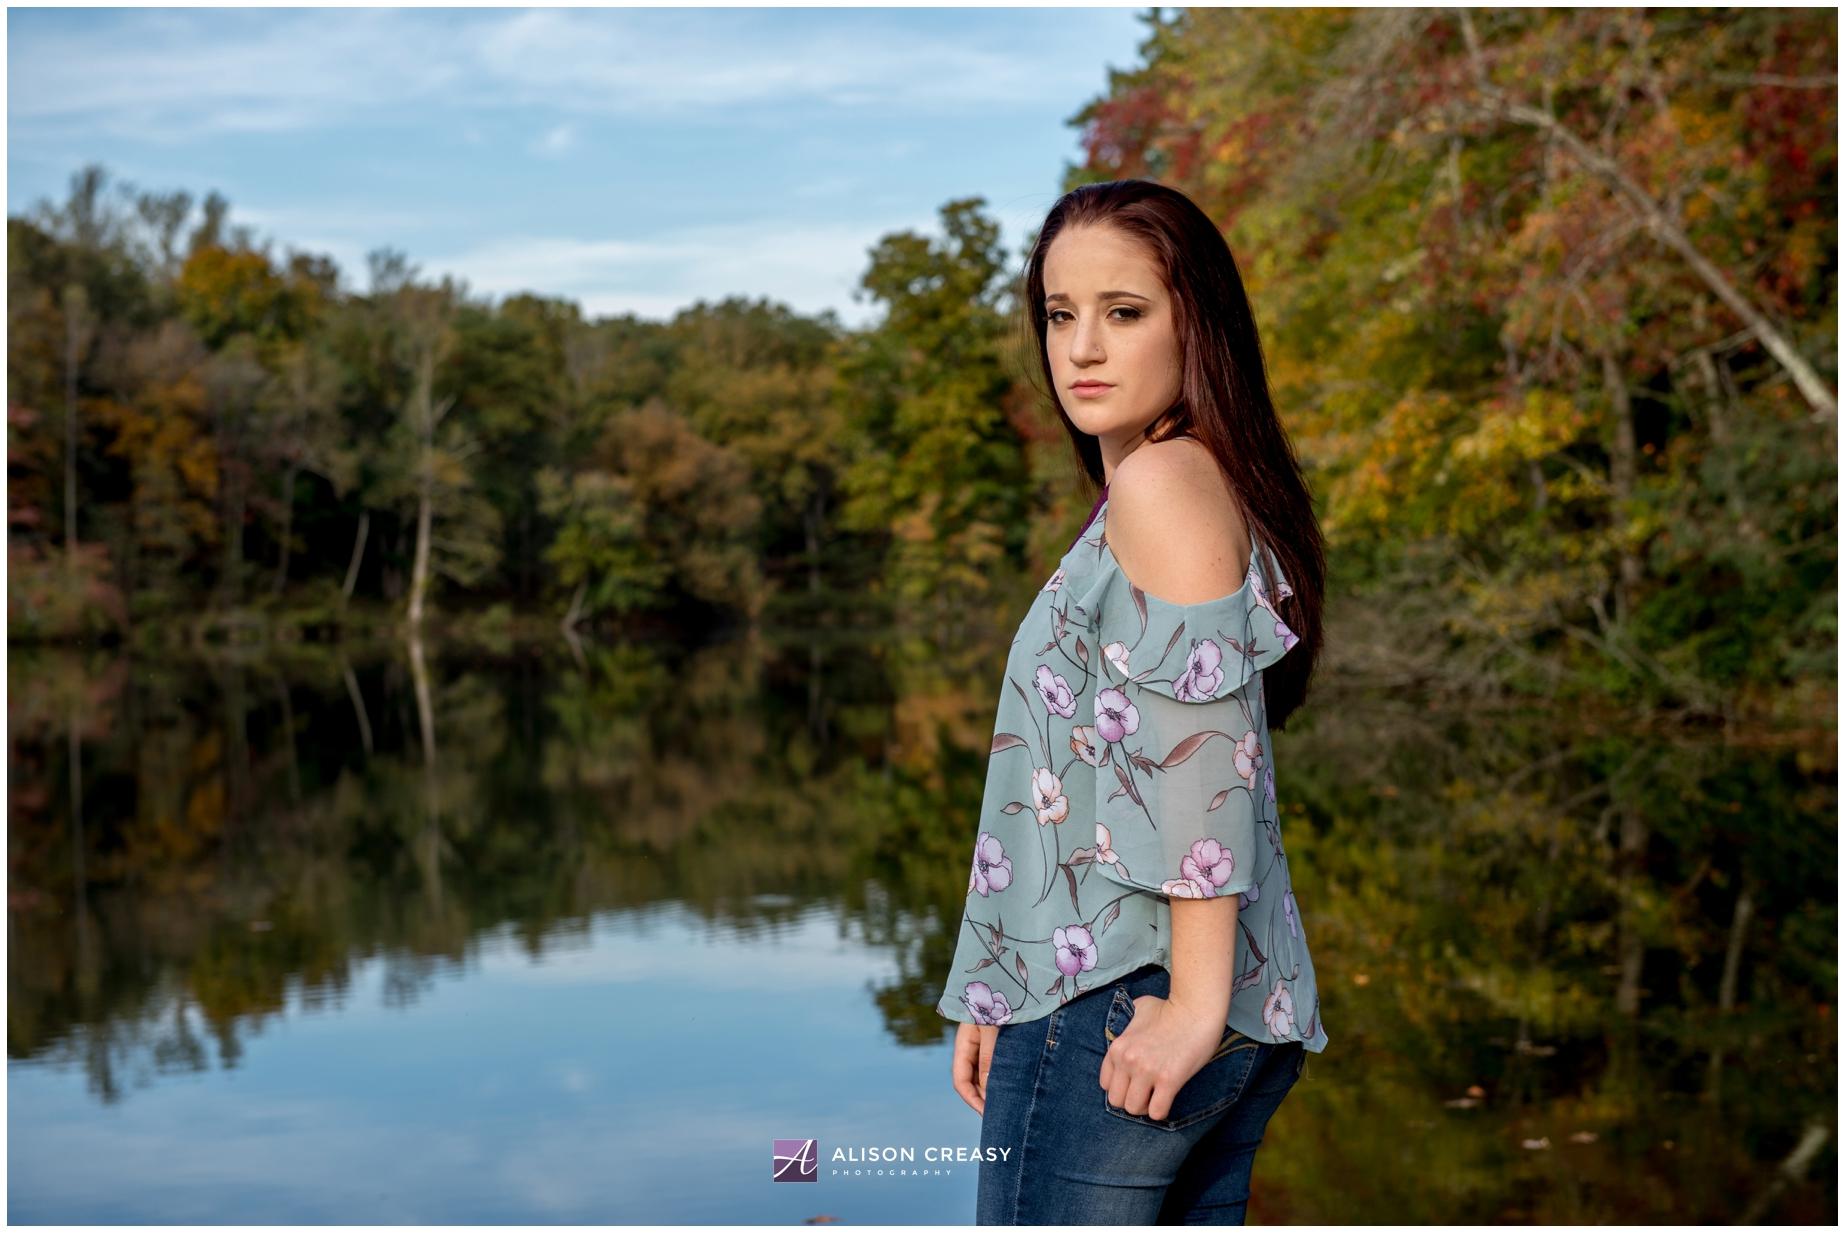 Alison-Creasy-Photography-Lynchburg-VA-Photographer_0950.jpg